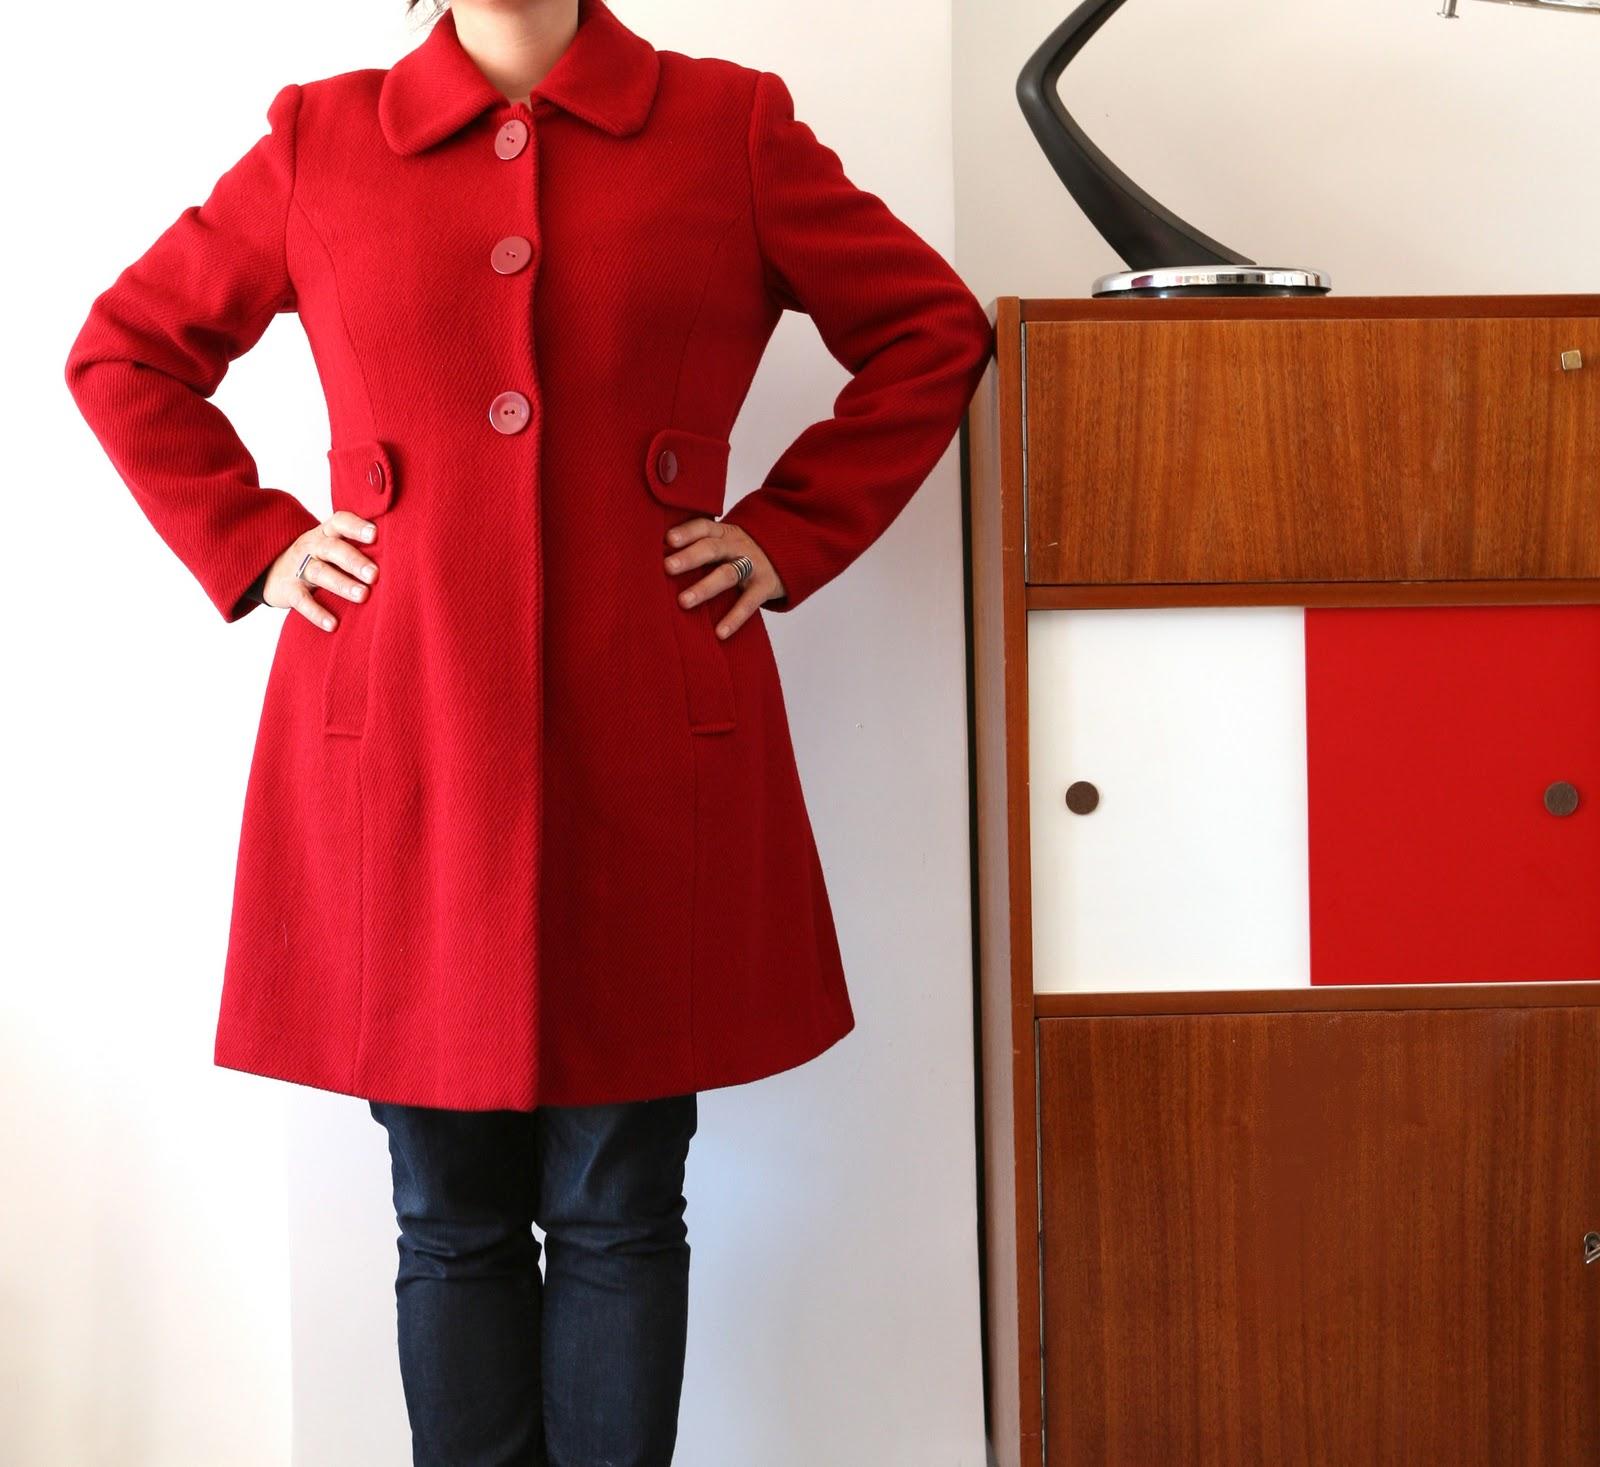 baos manteau 3 4 rouge femme taille 40 42. Black Bedroom Furniture Sets. Home Design Ideas